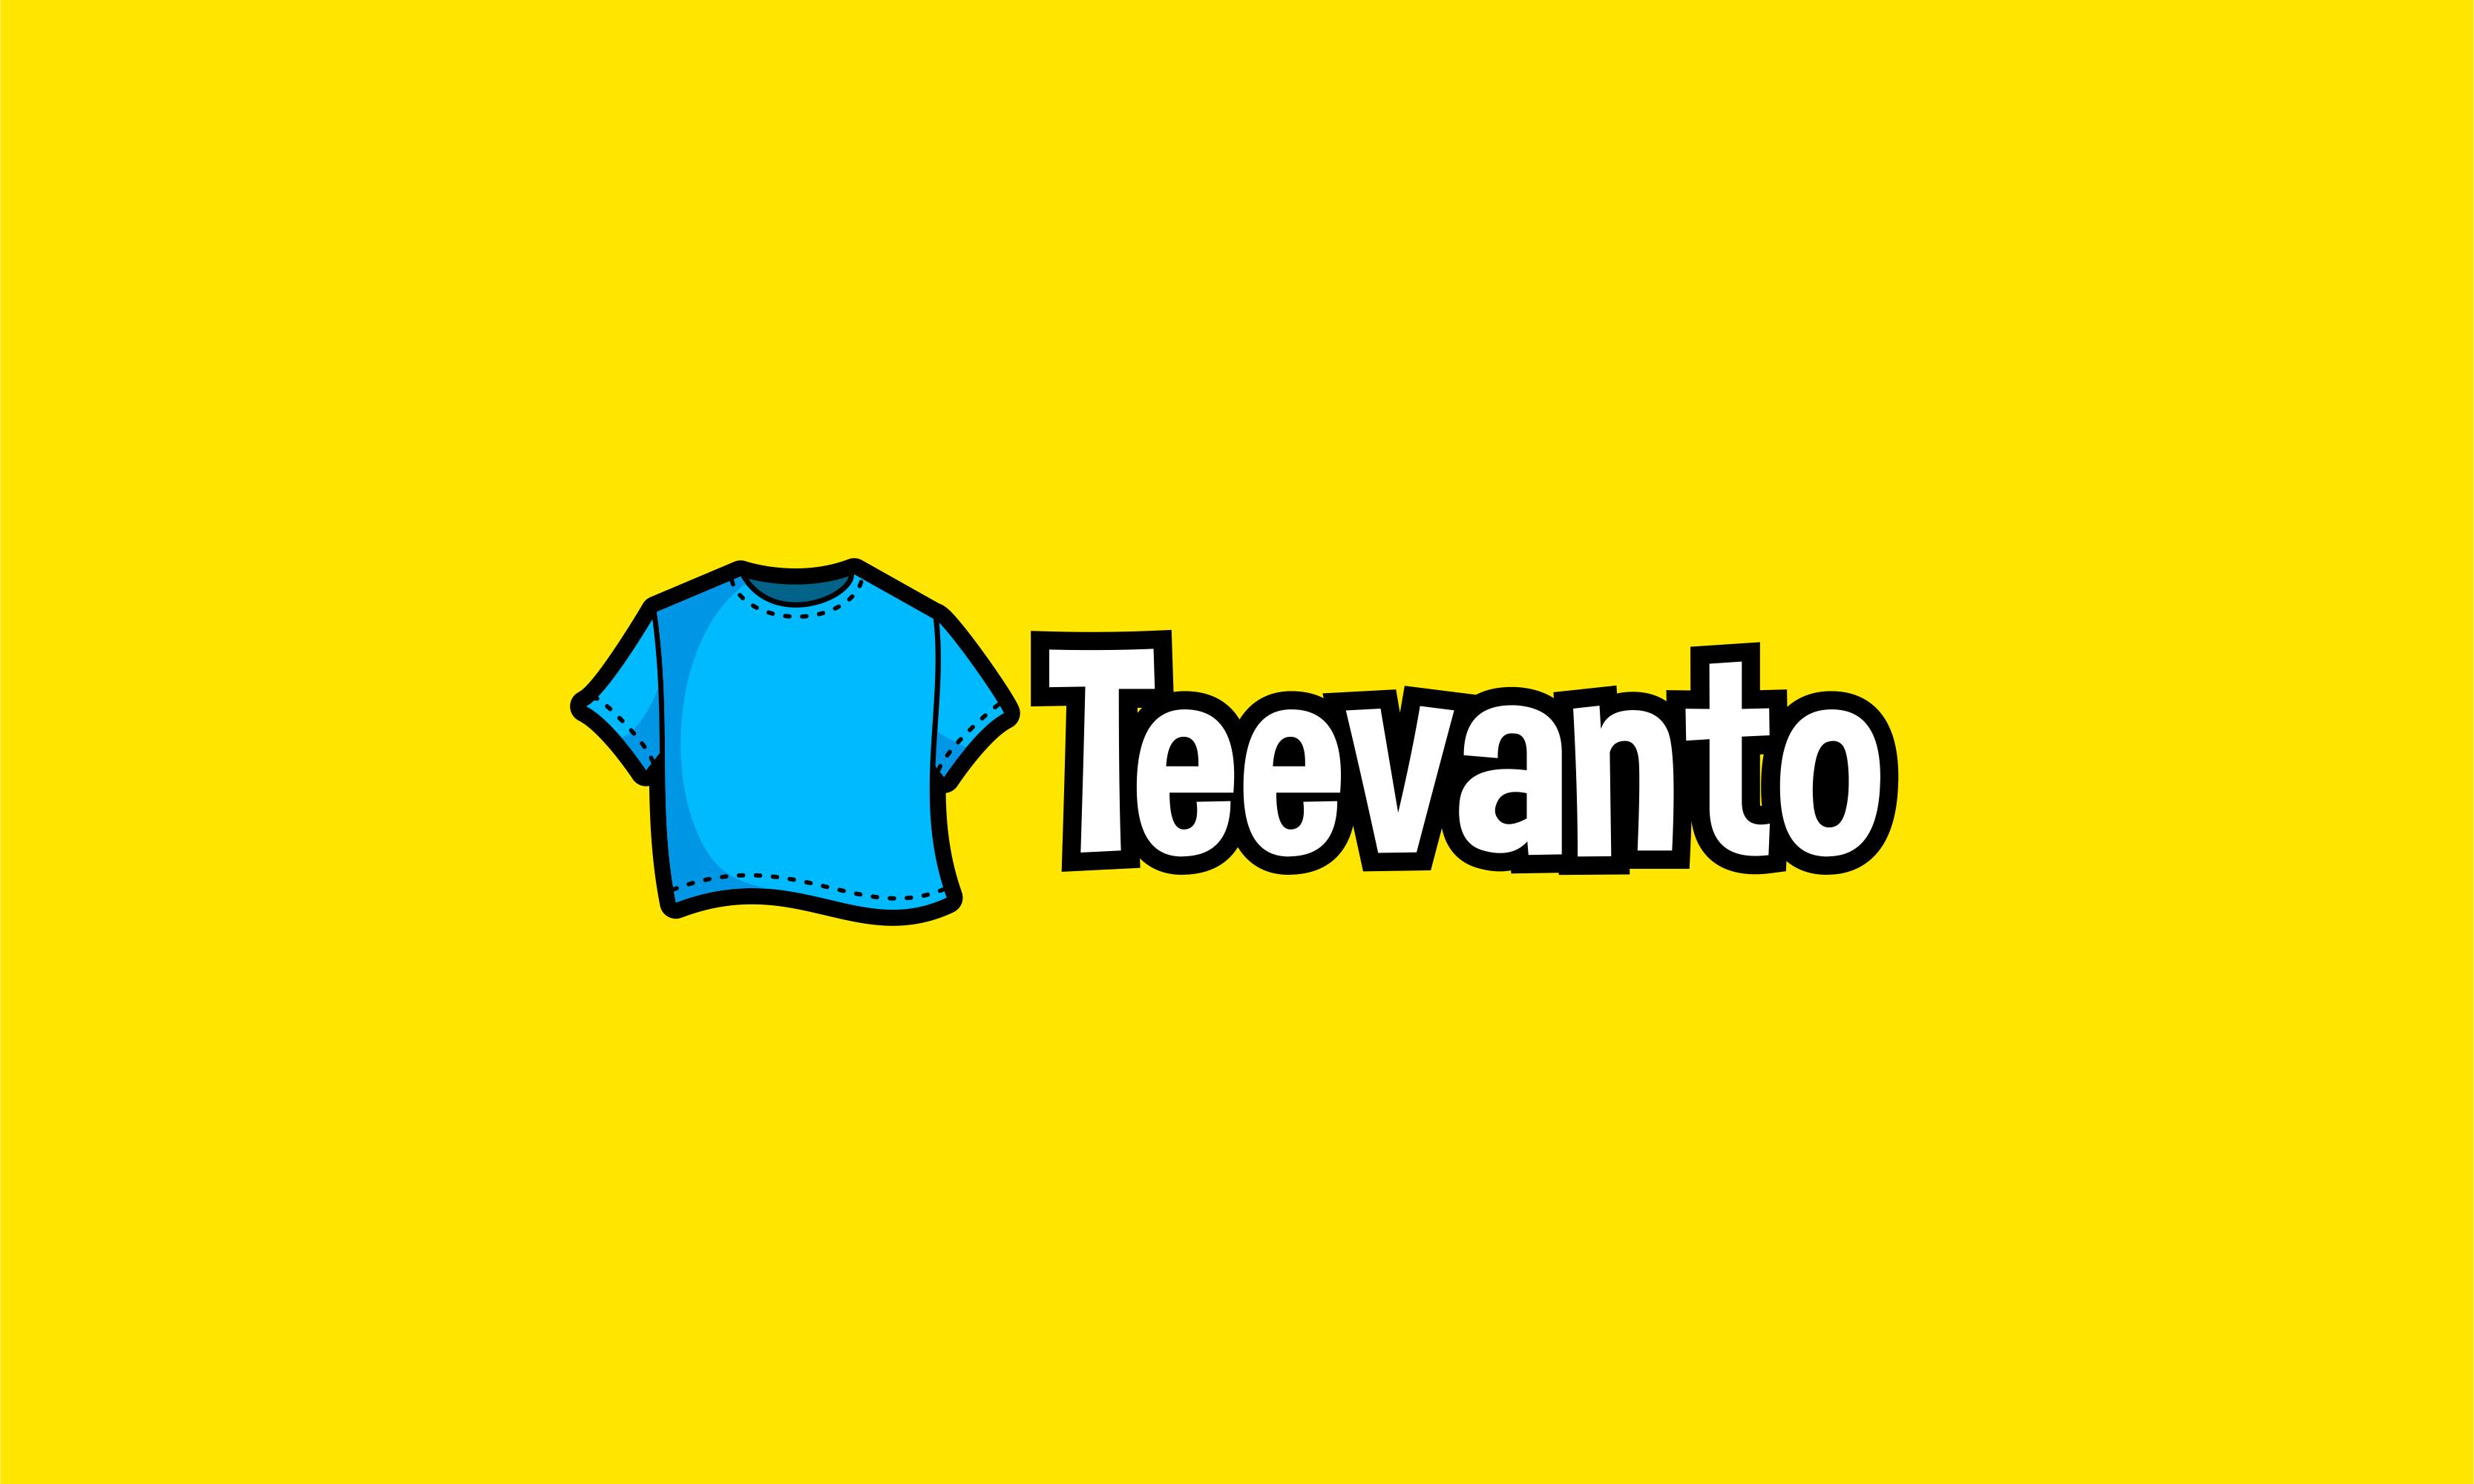 Teevanto